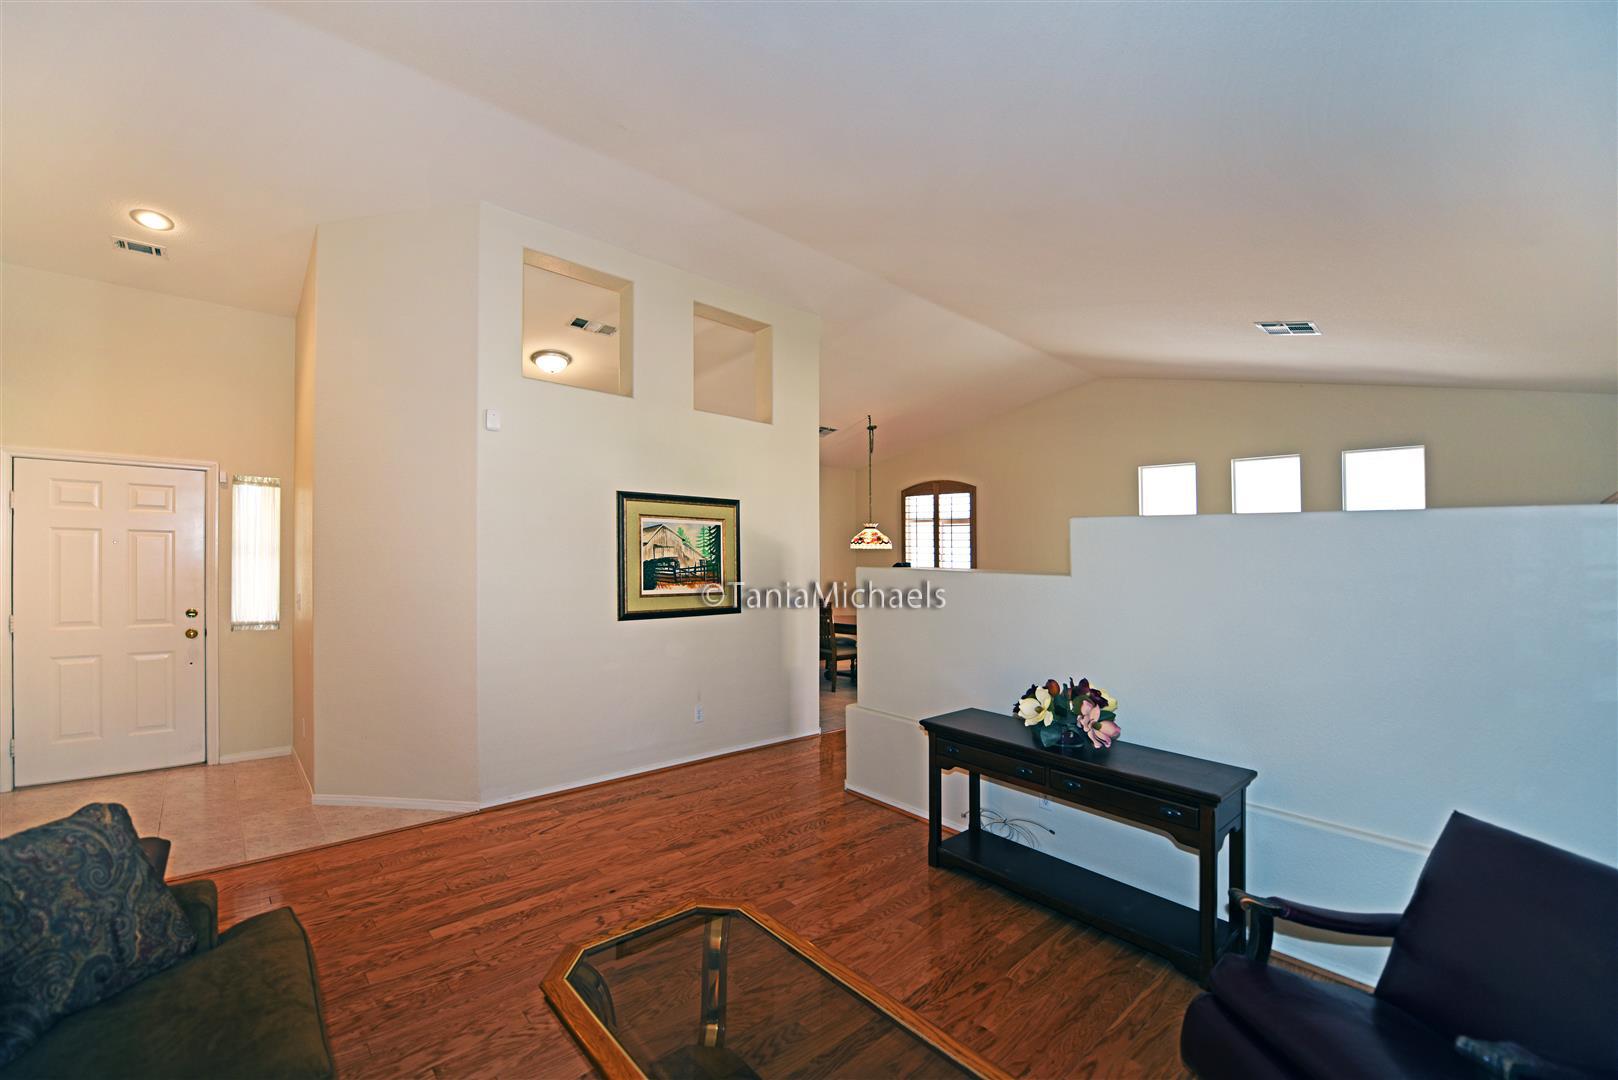 kitchen cabinets for sale by owner refurbished sunrise manor homes las vegas nv | 1040 caramel ...